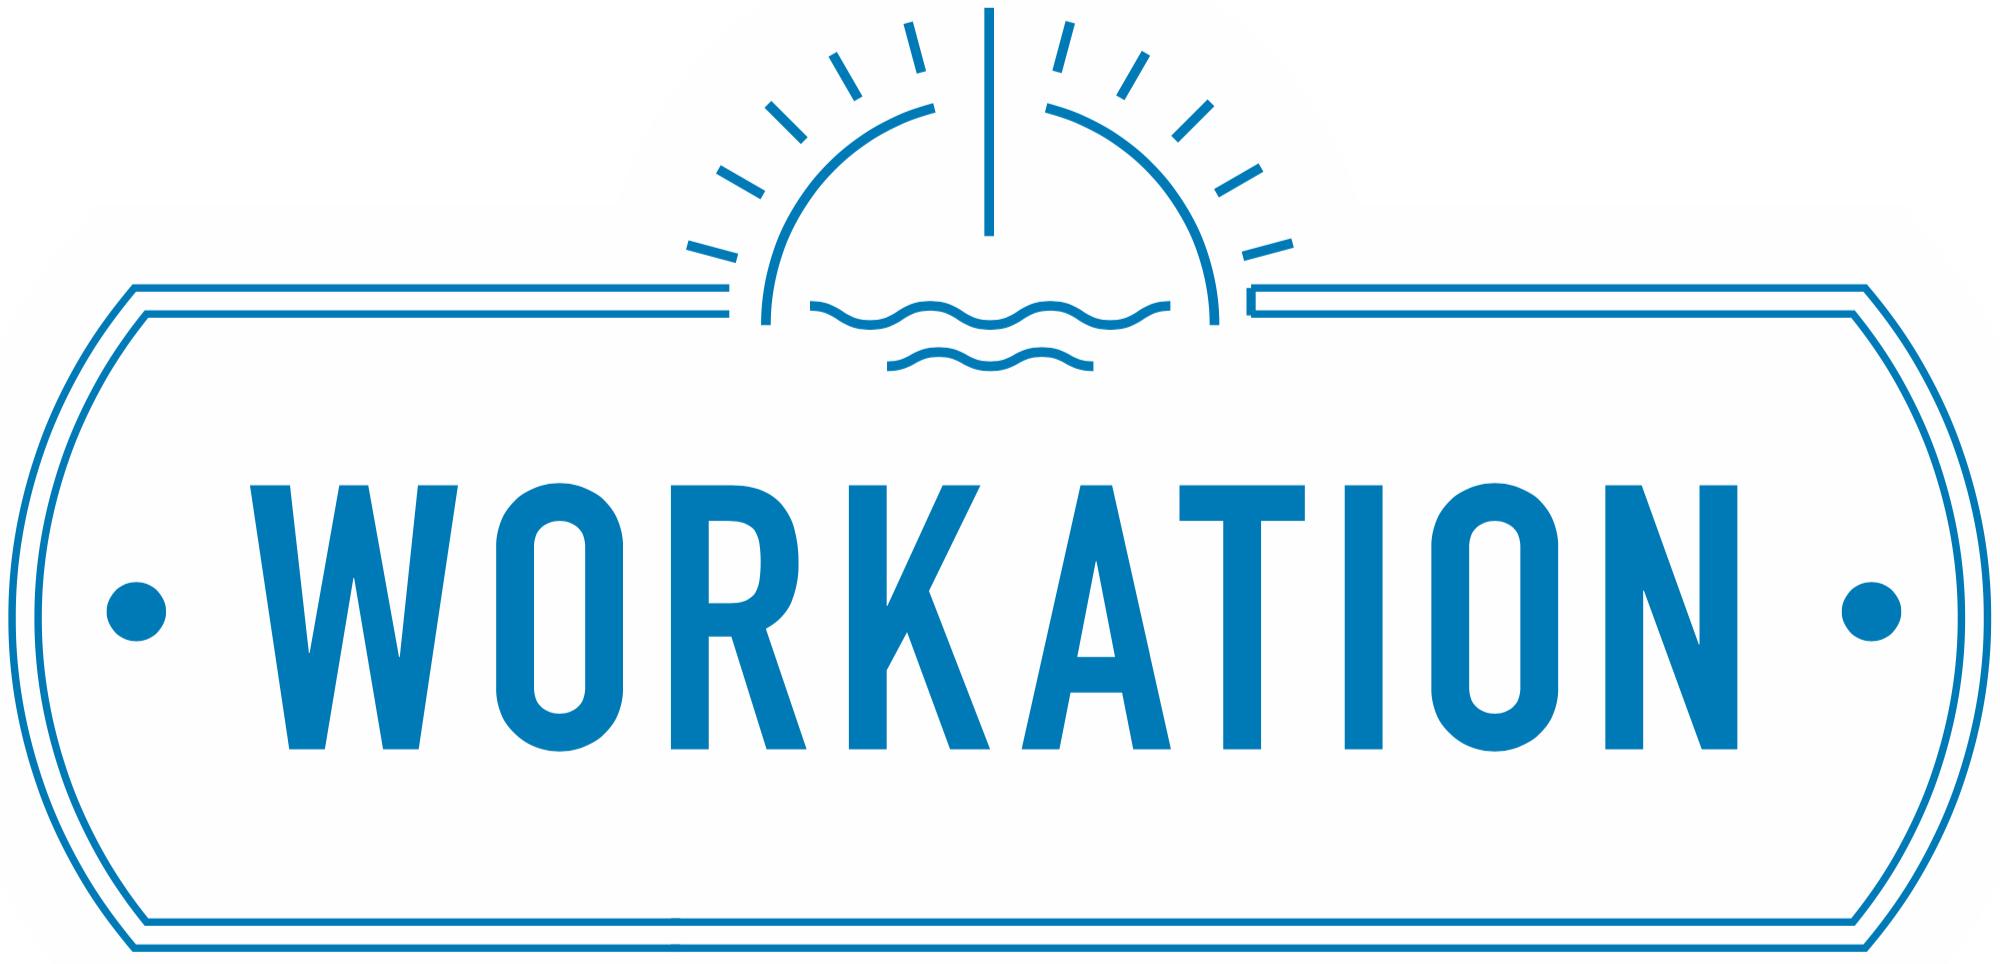 Workation Network|一般社団法人 ワーケーションネットワーク